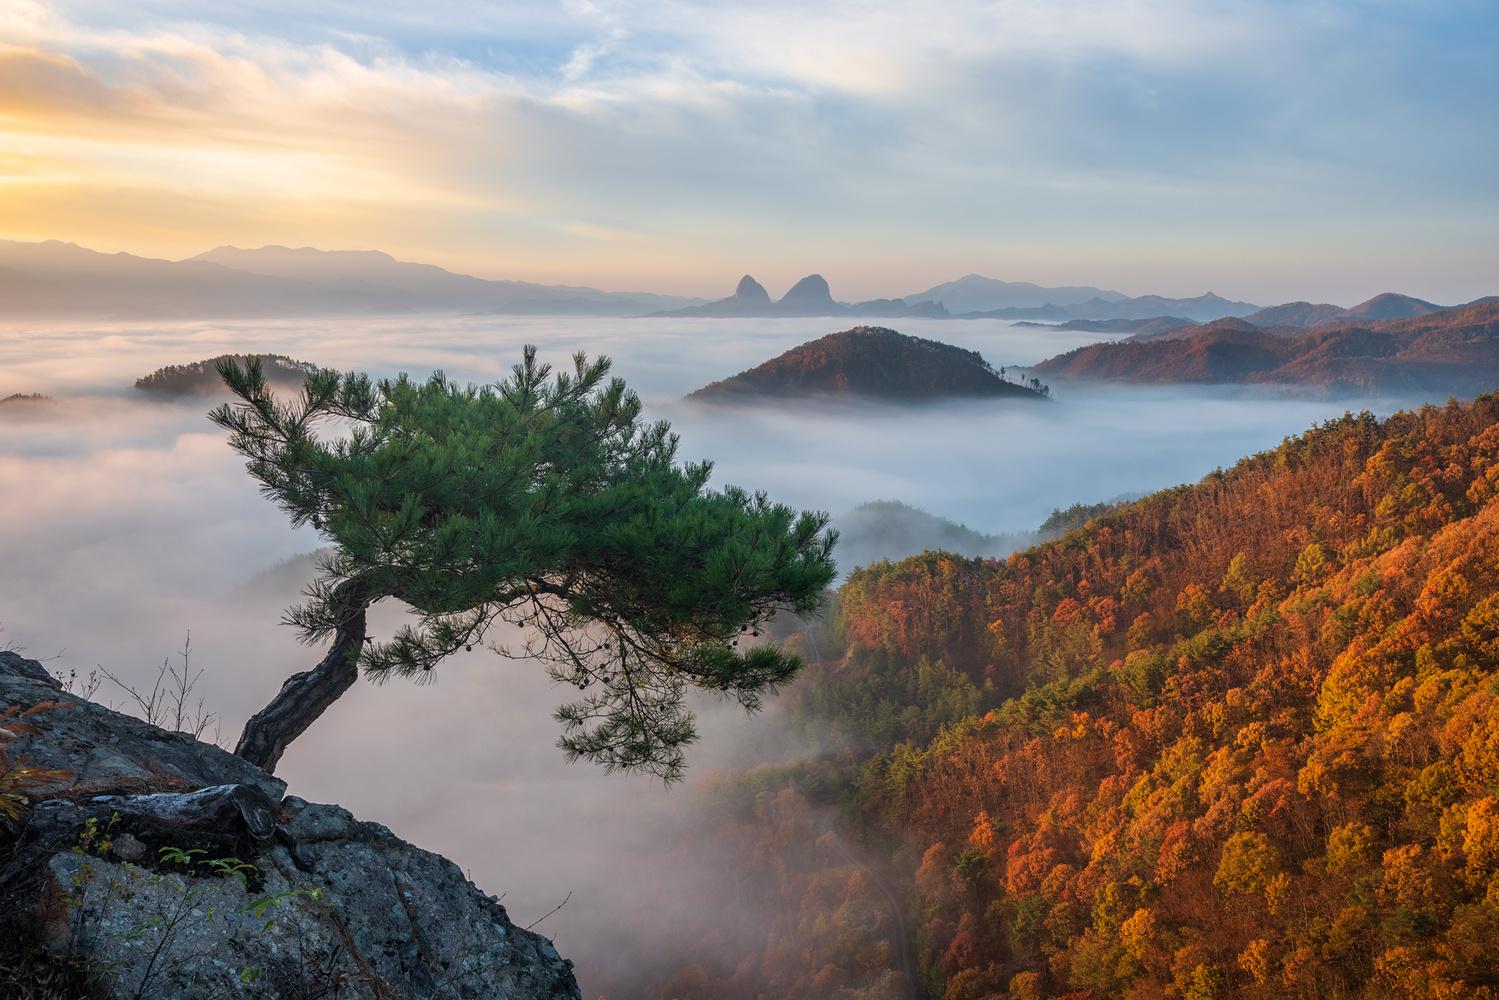 The Last Pine by jaeyoun Ryu